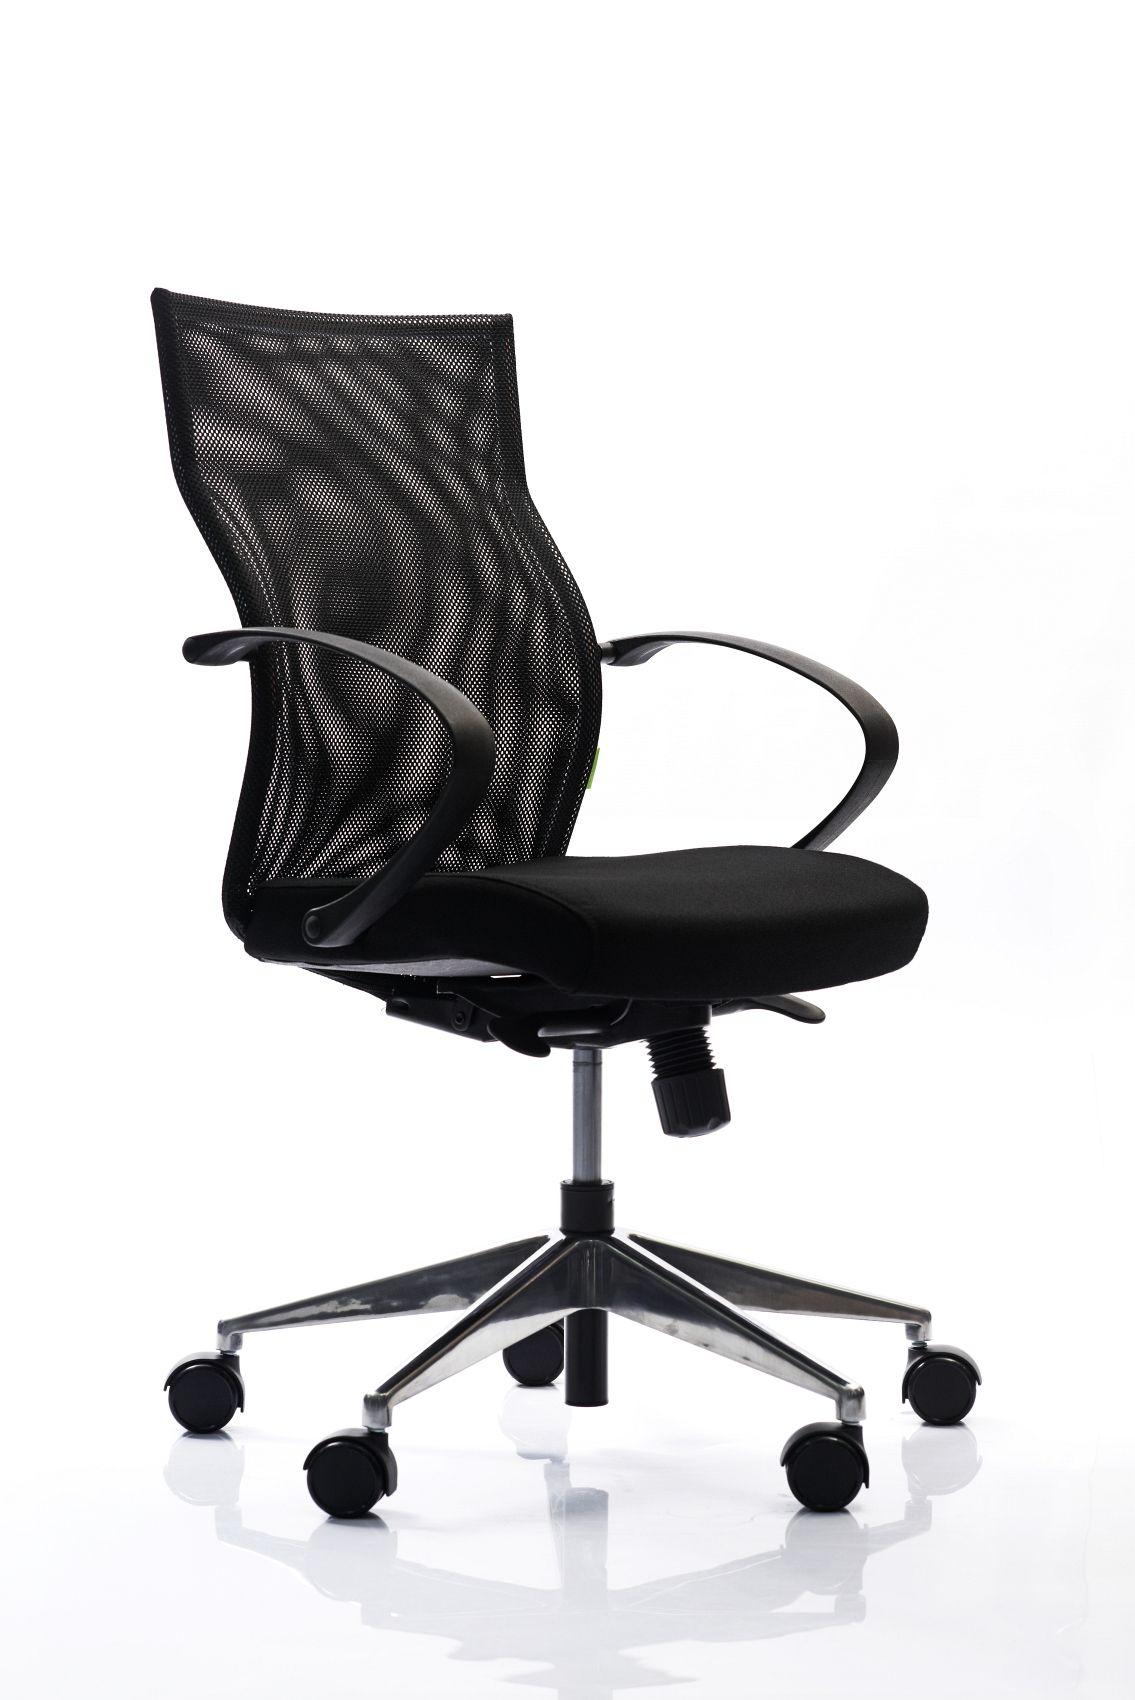 Ecko Operators Chair